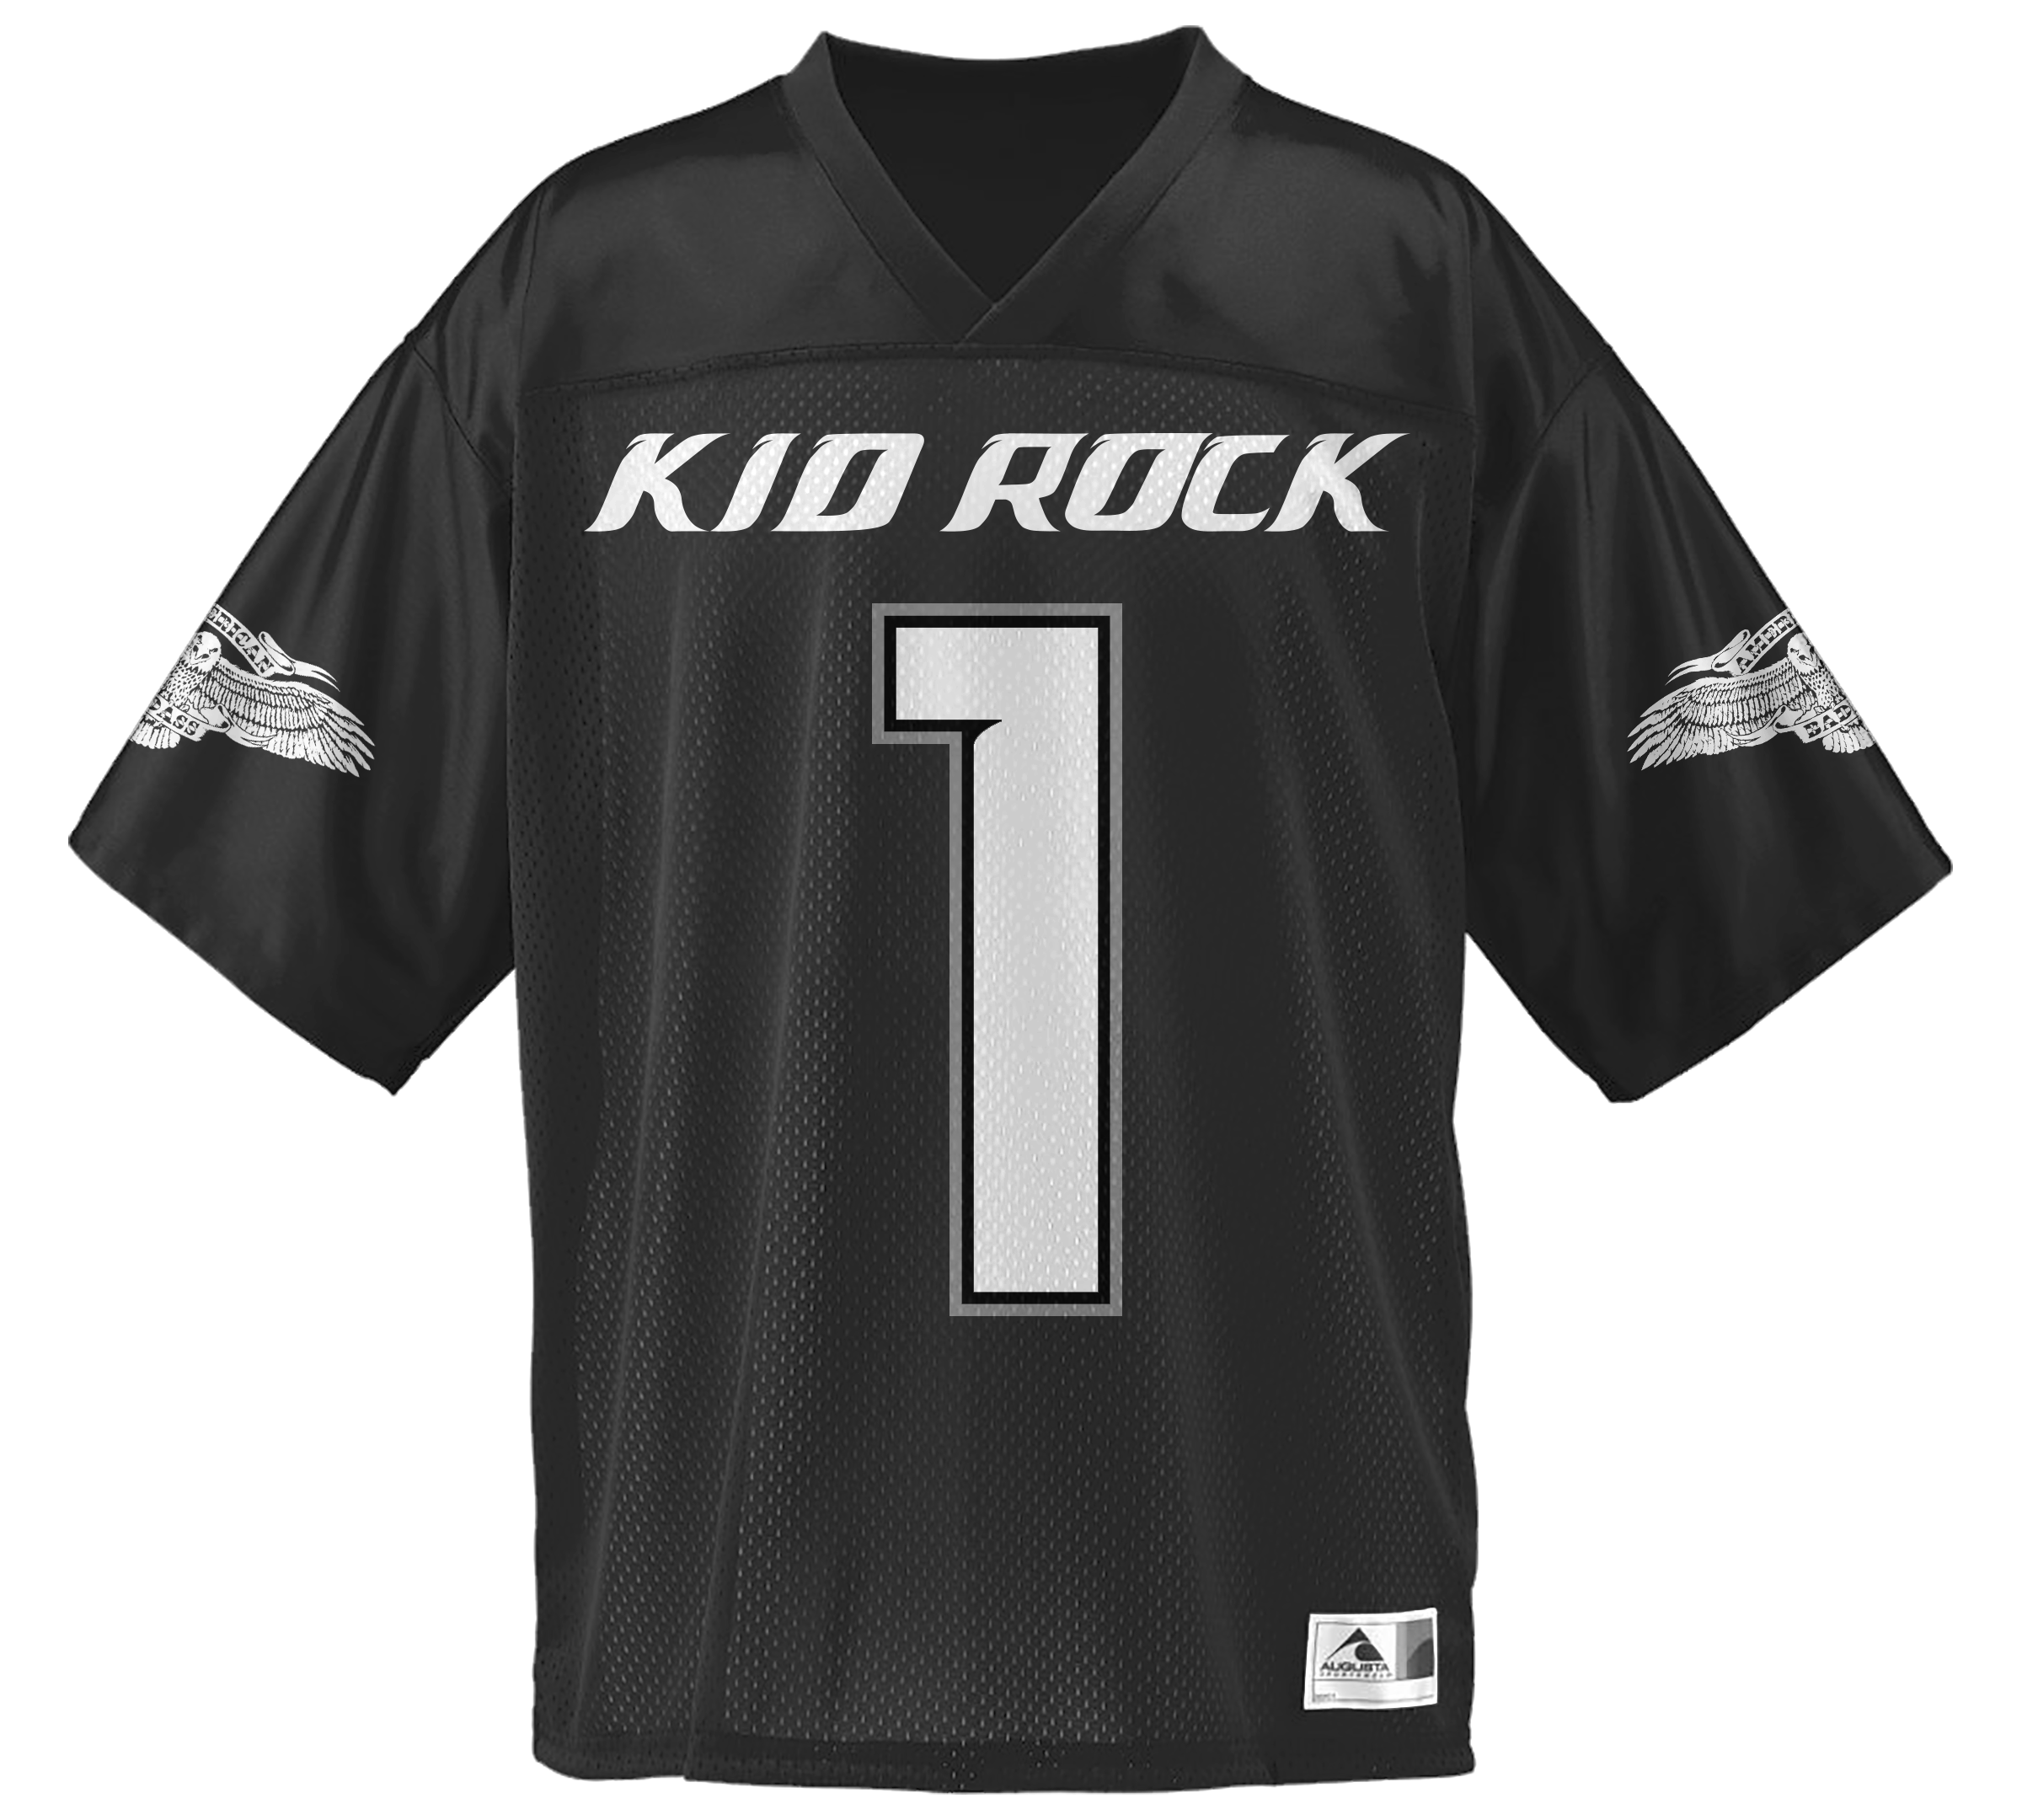 kr_rockfootballjersey_flat_front_m.png